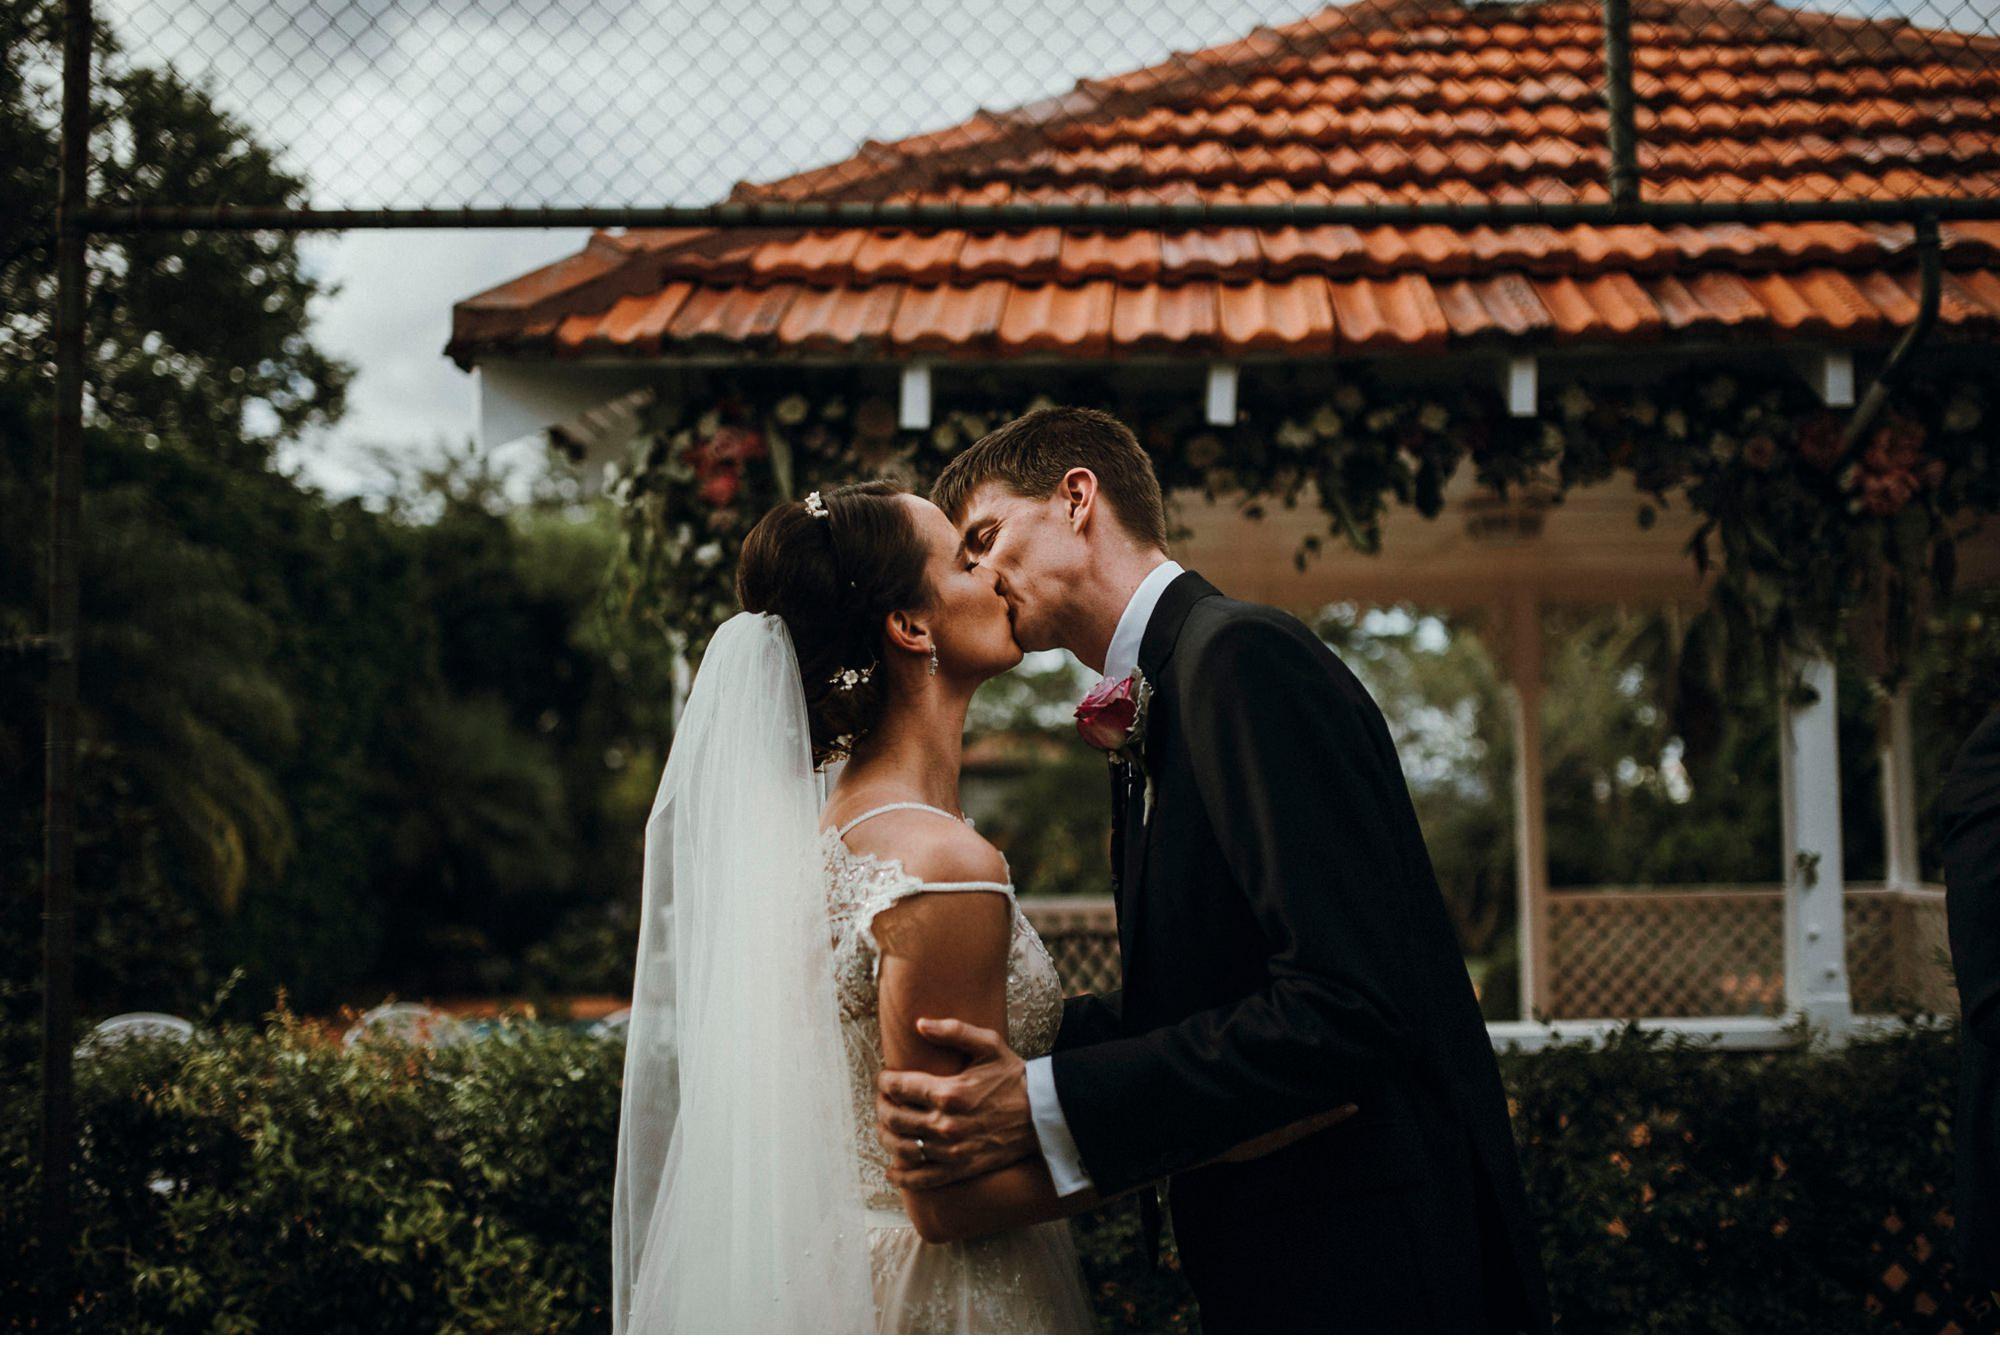 Brisbane_Shona and James_Morgan Roberts_1717.jpg